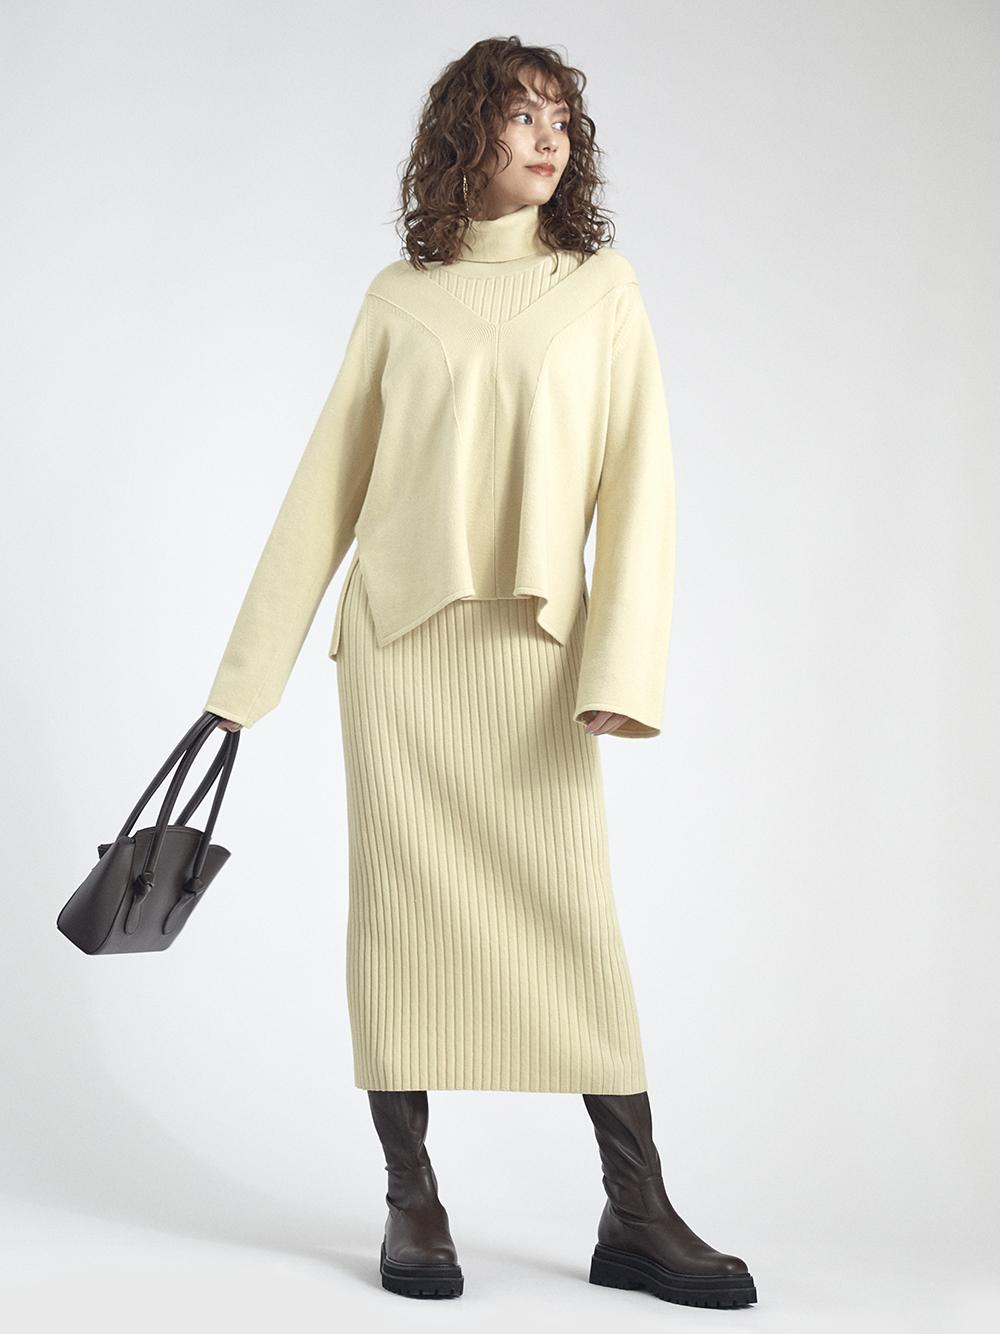 V領上衣層次連身裙組合